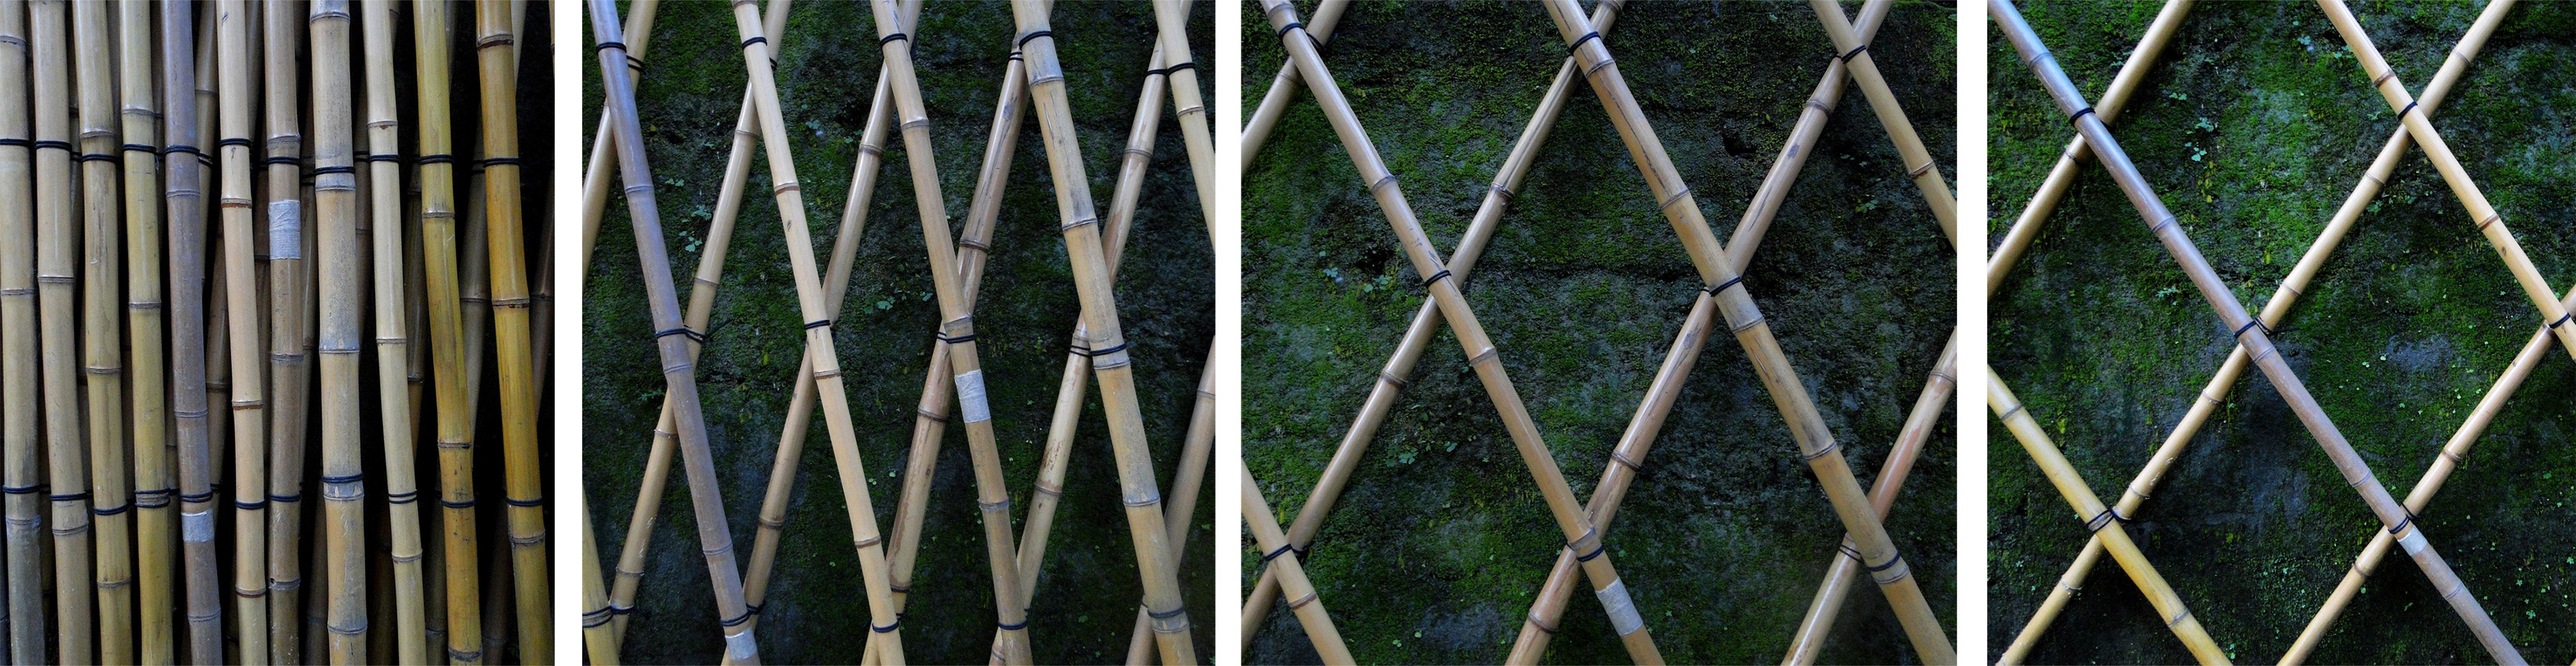 Pantographic-Bamboo-Mechanism.jpg